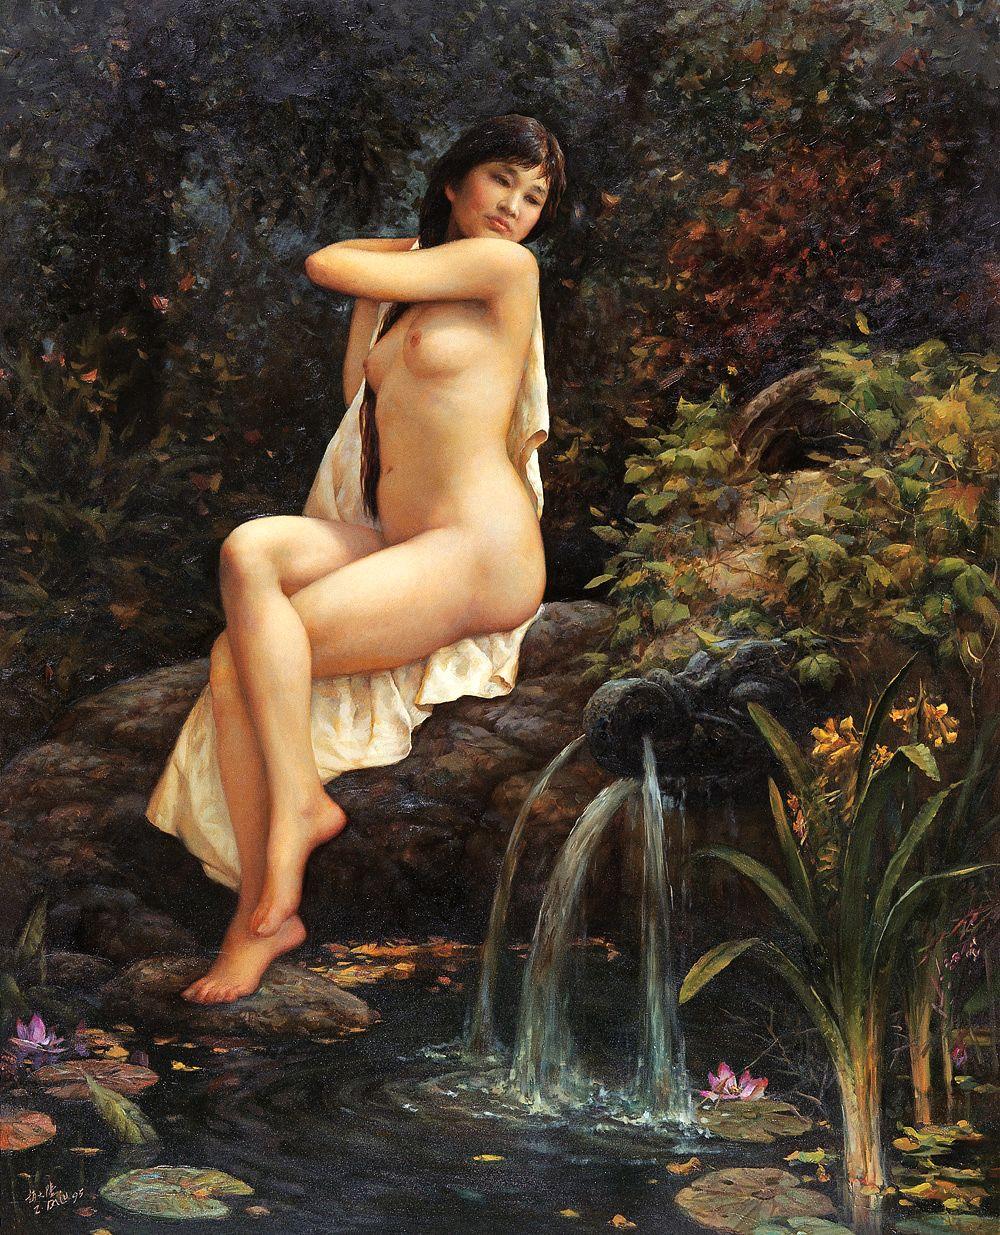 krasivaya-russkaya-erotika-foto